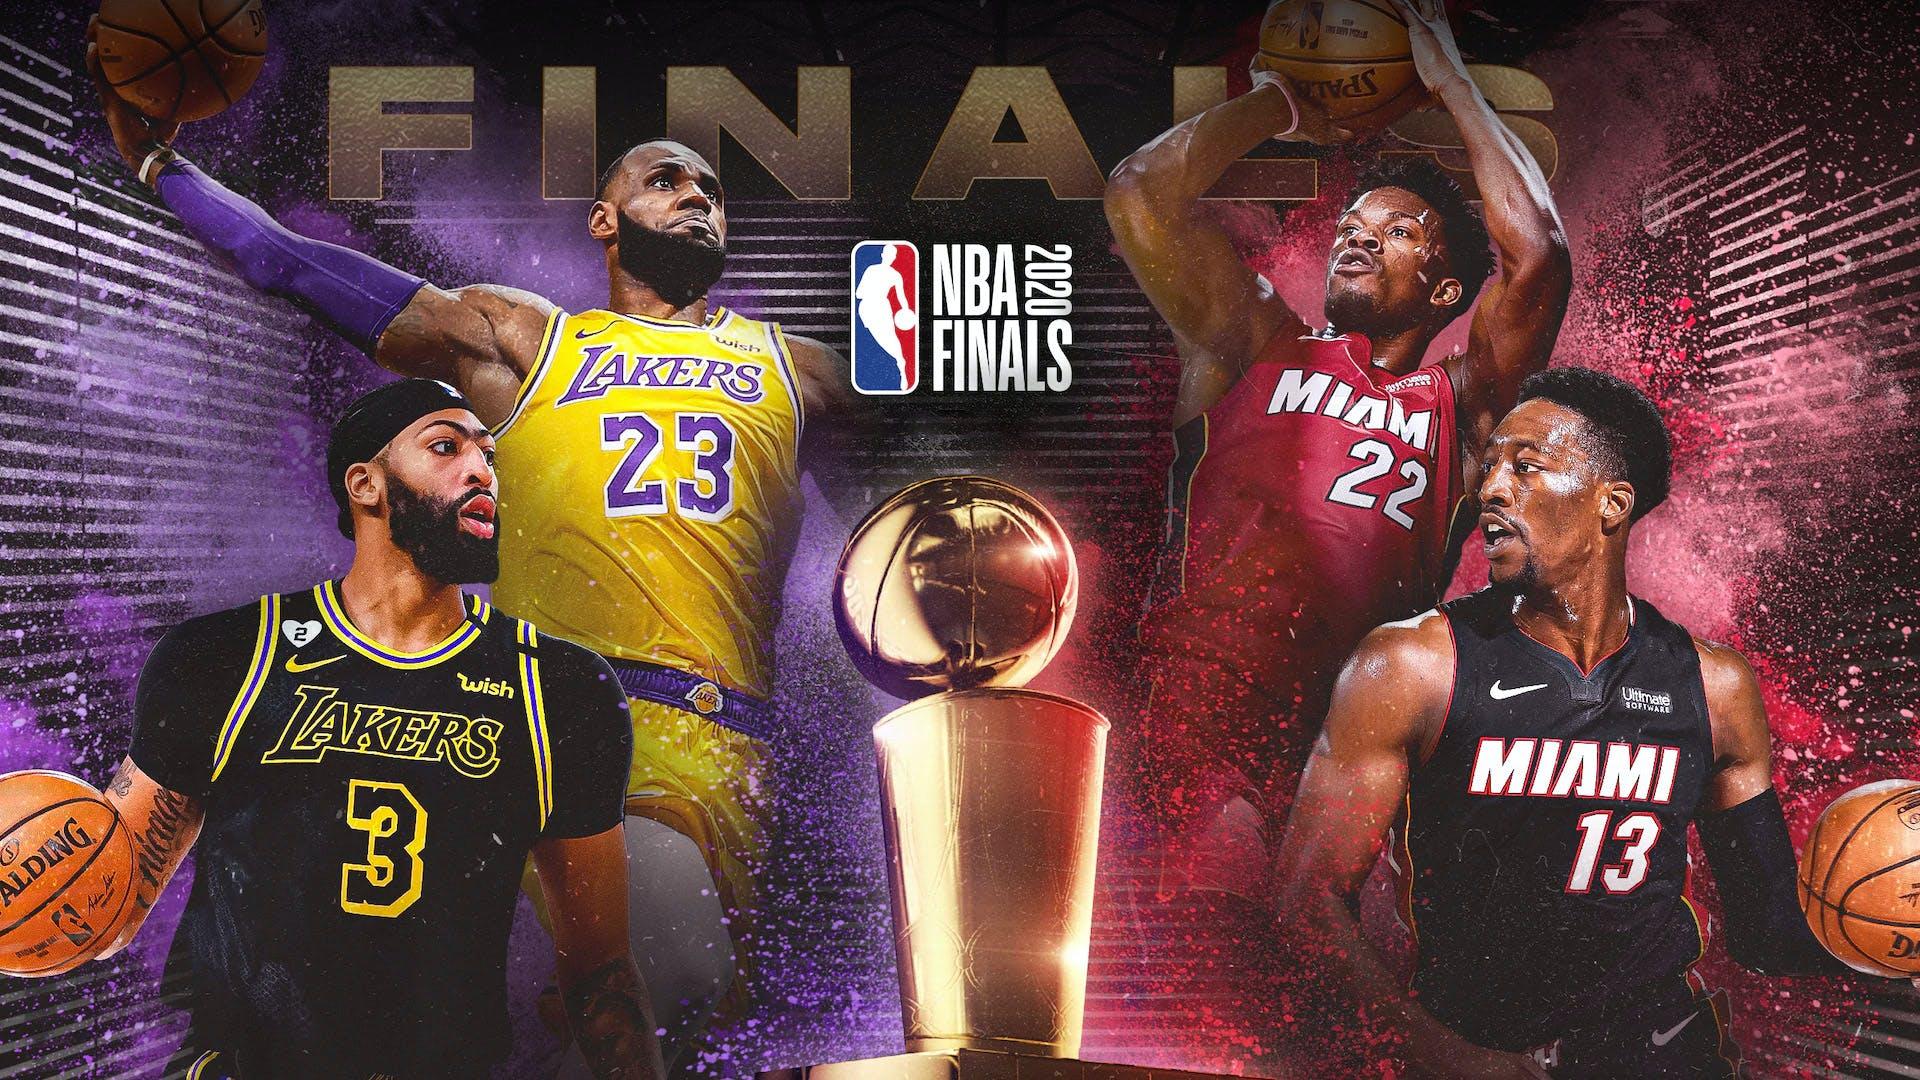 Los Angeles Lakers 2020 Nba Finals Champions Wallpapers Wallpaper Cave